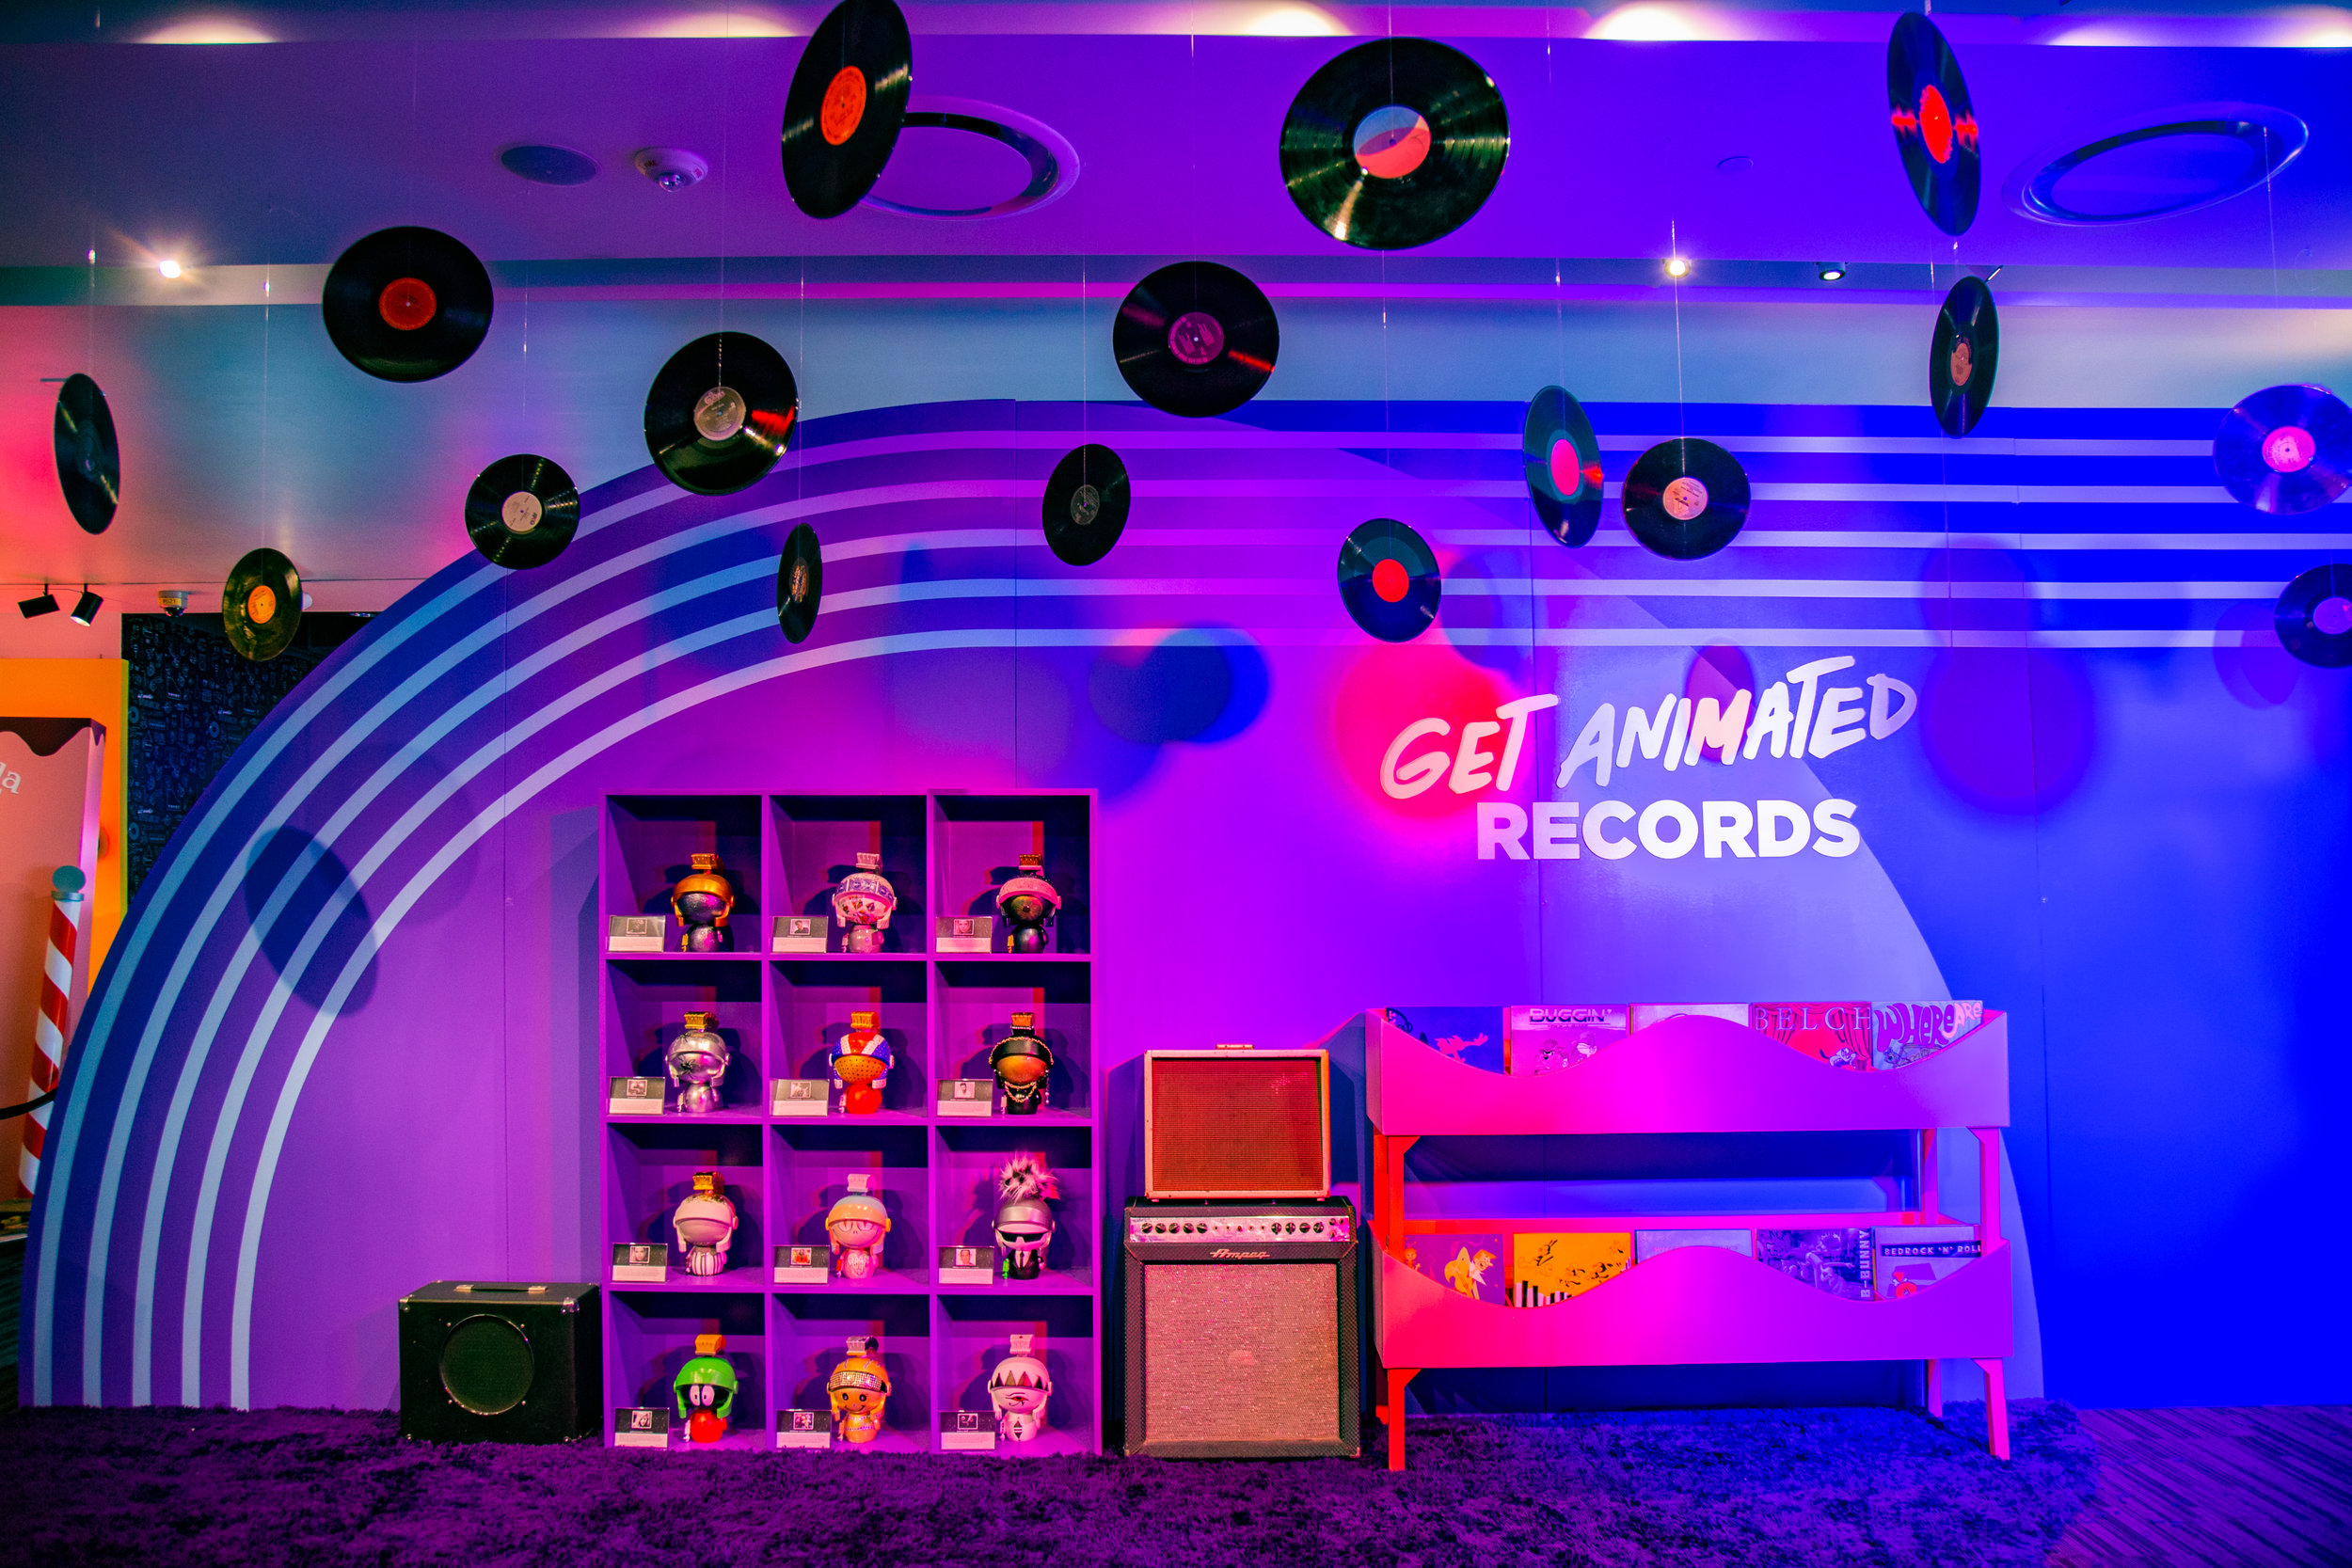 Senior Art Direction of The Get Animated Invasion Grammy Museum pop-up - Client: Warner Bros.